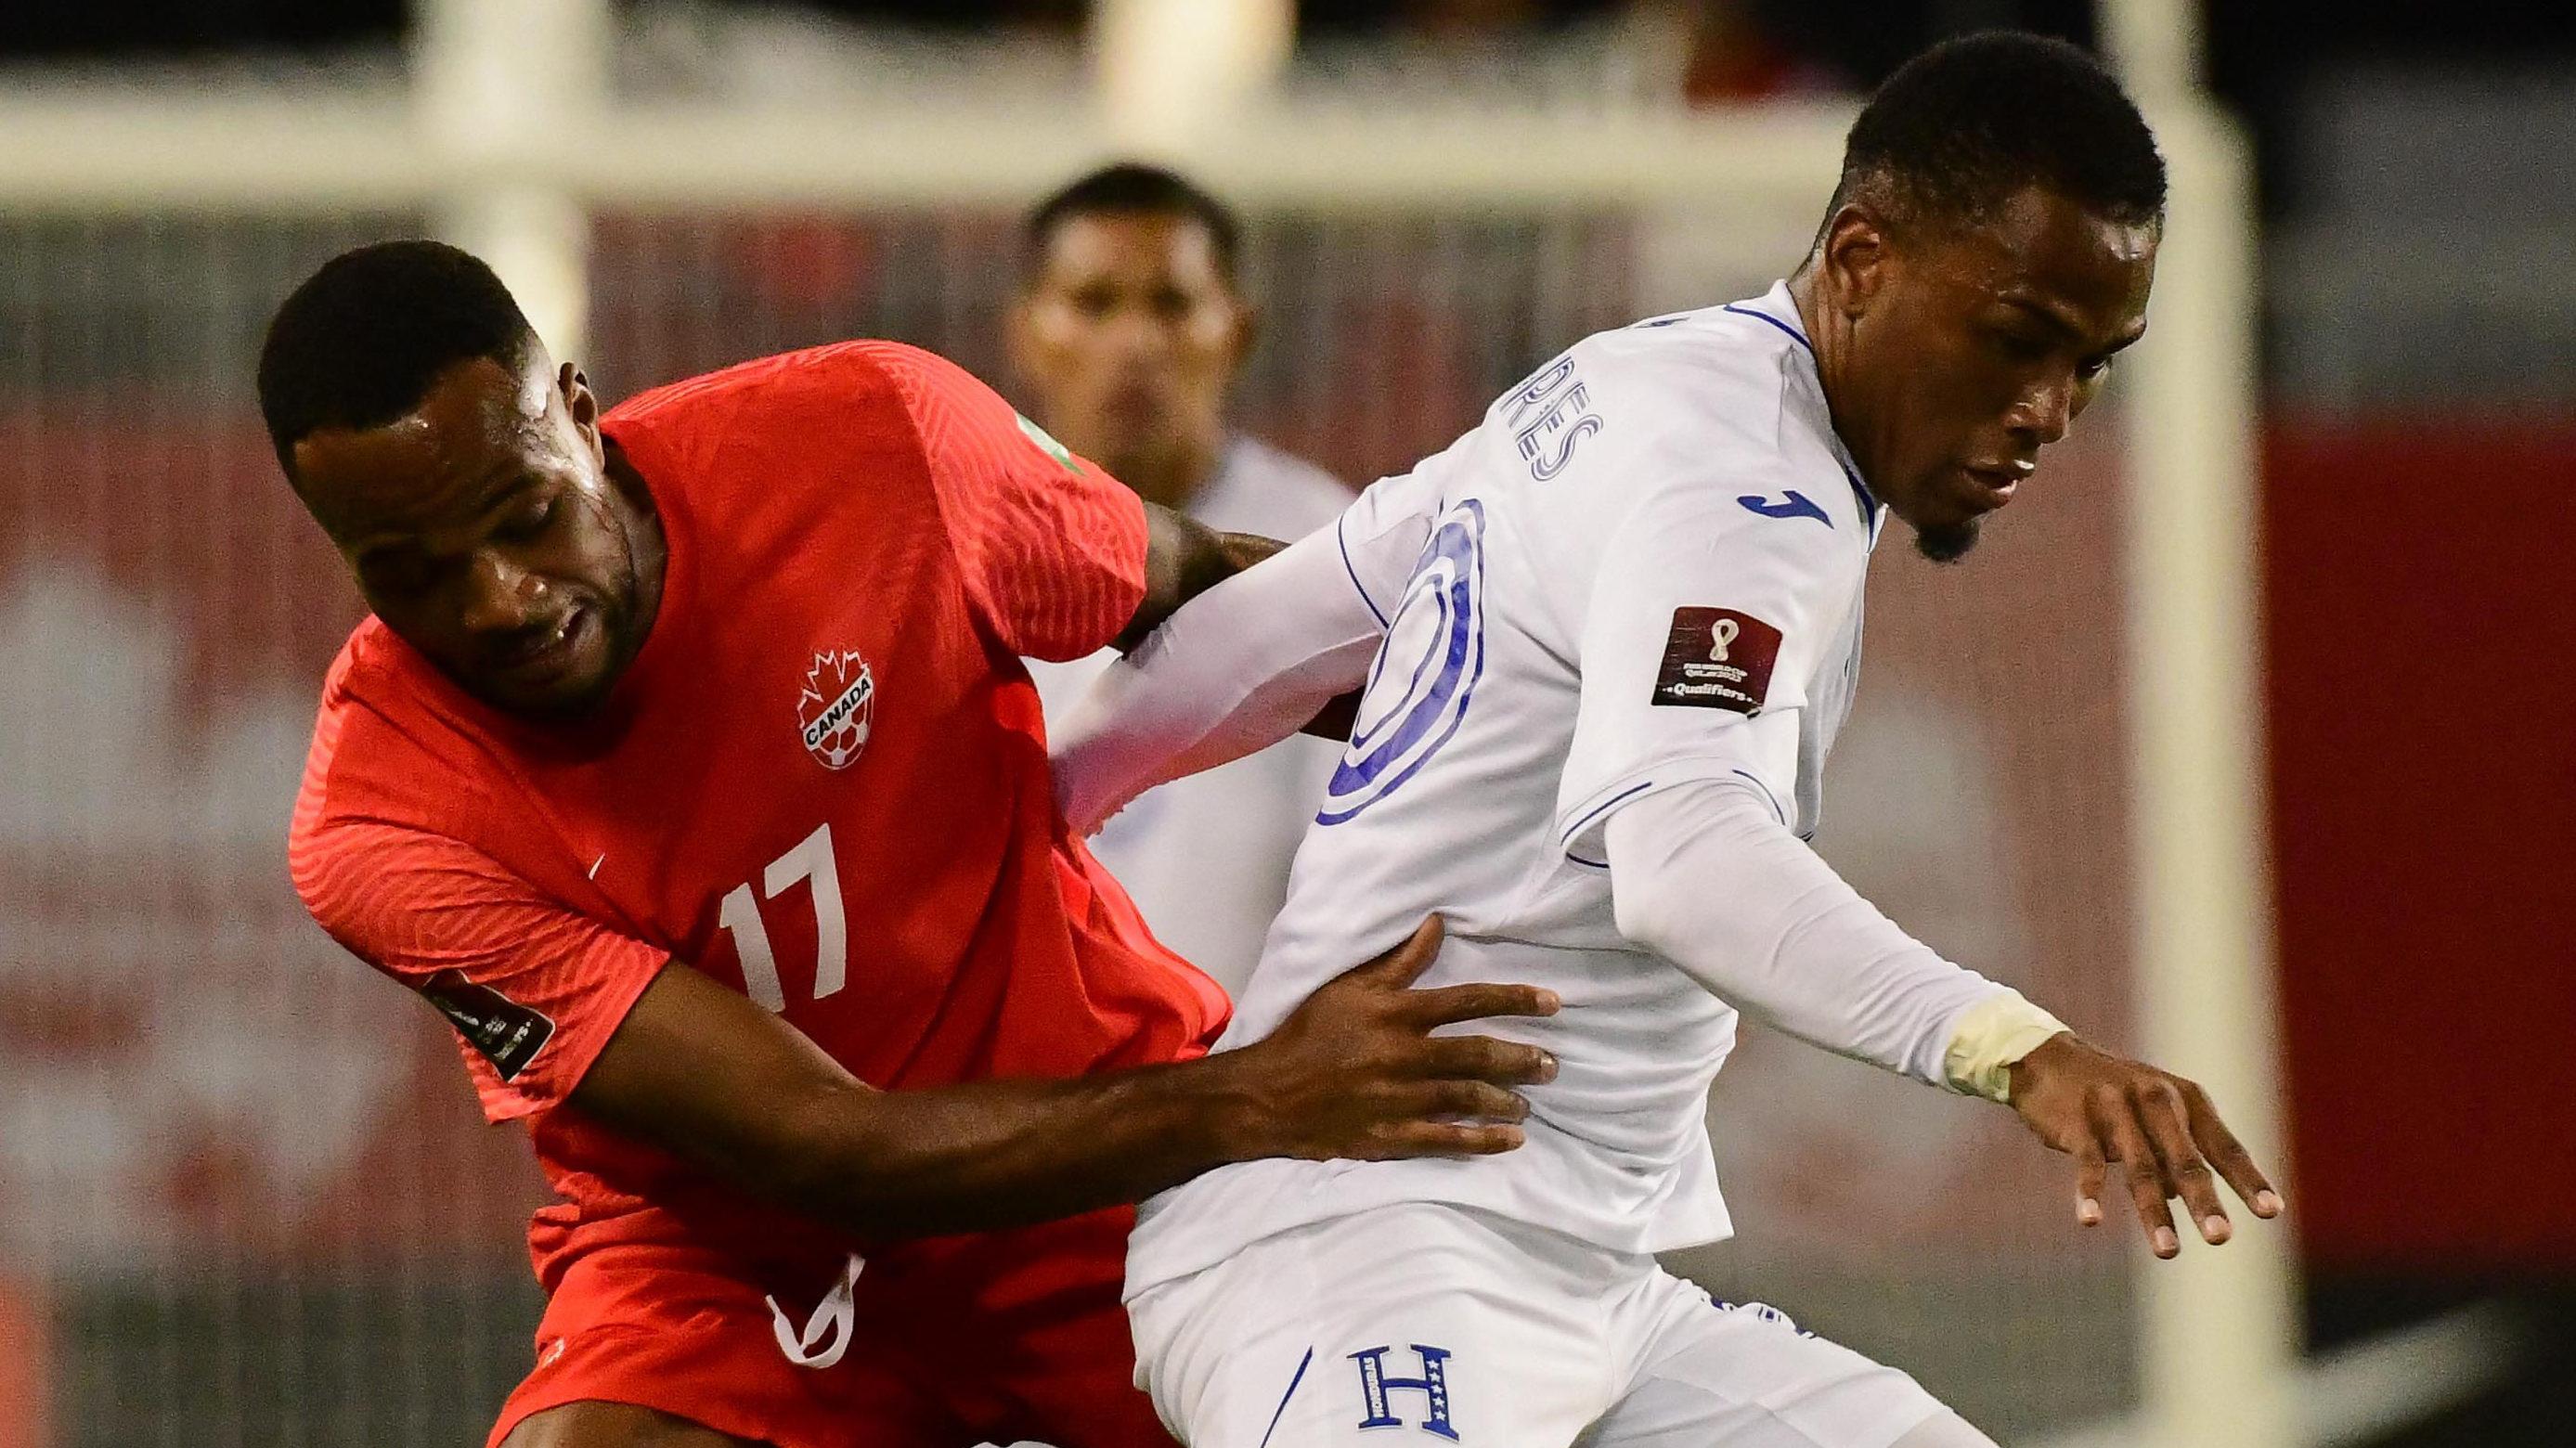 Cyle Larin battles Honduras' Deybi Flores for possession. (Canada Soccer/Martin Bazyl)